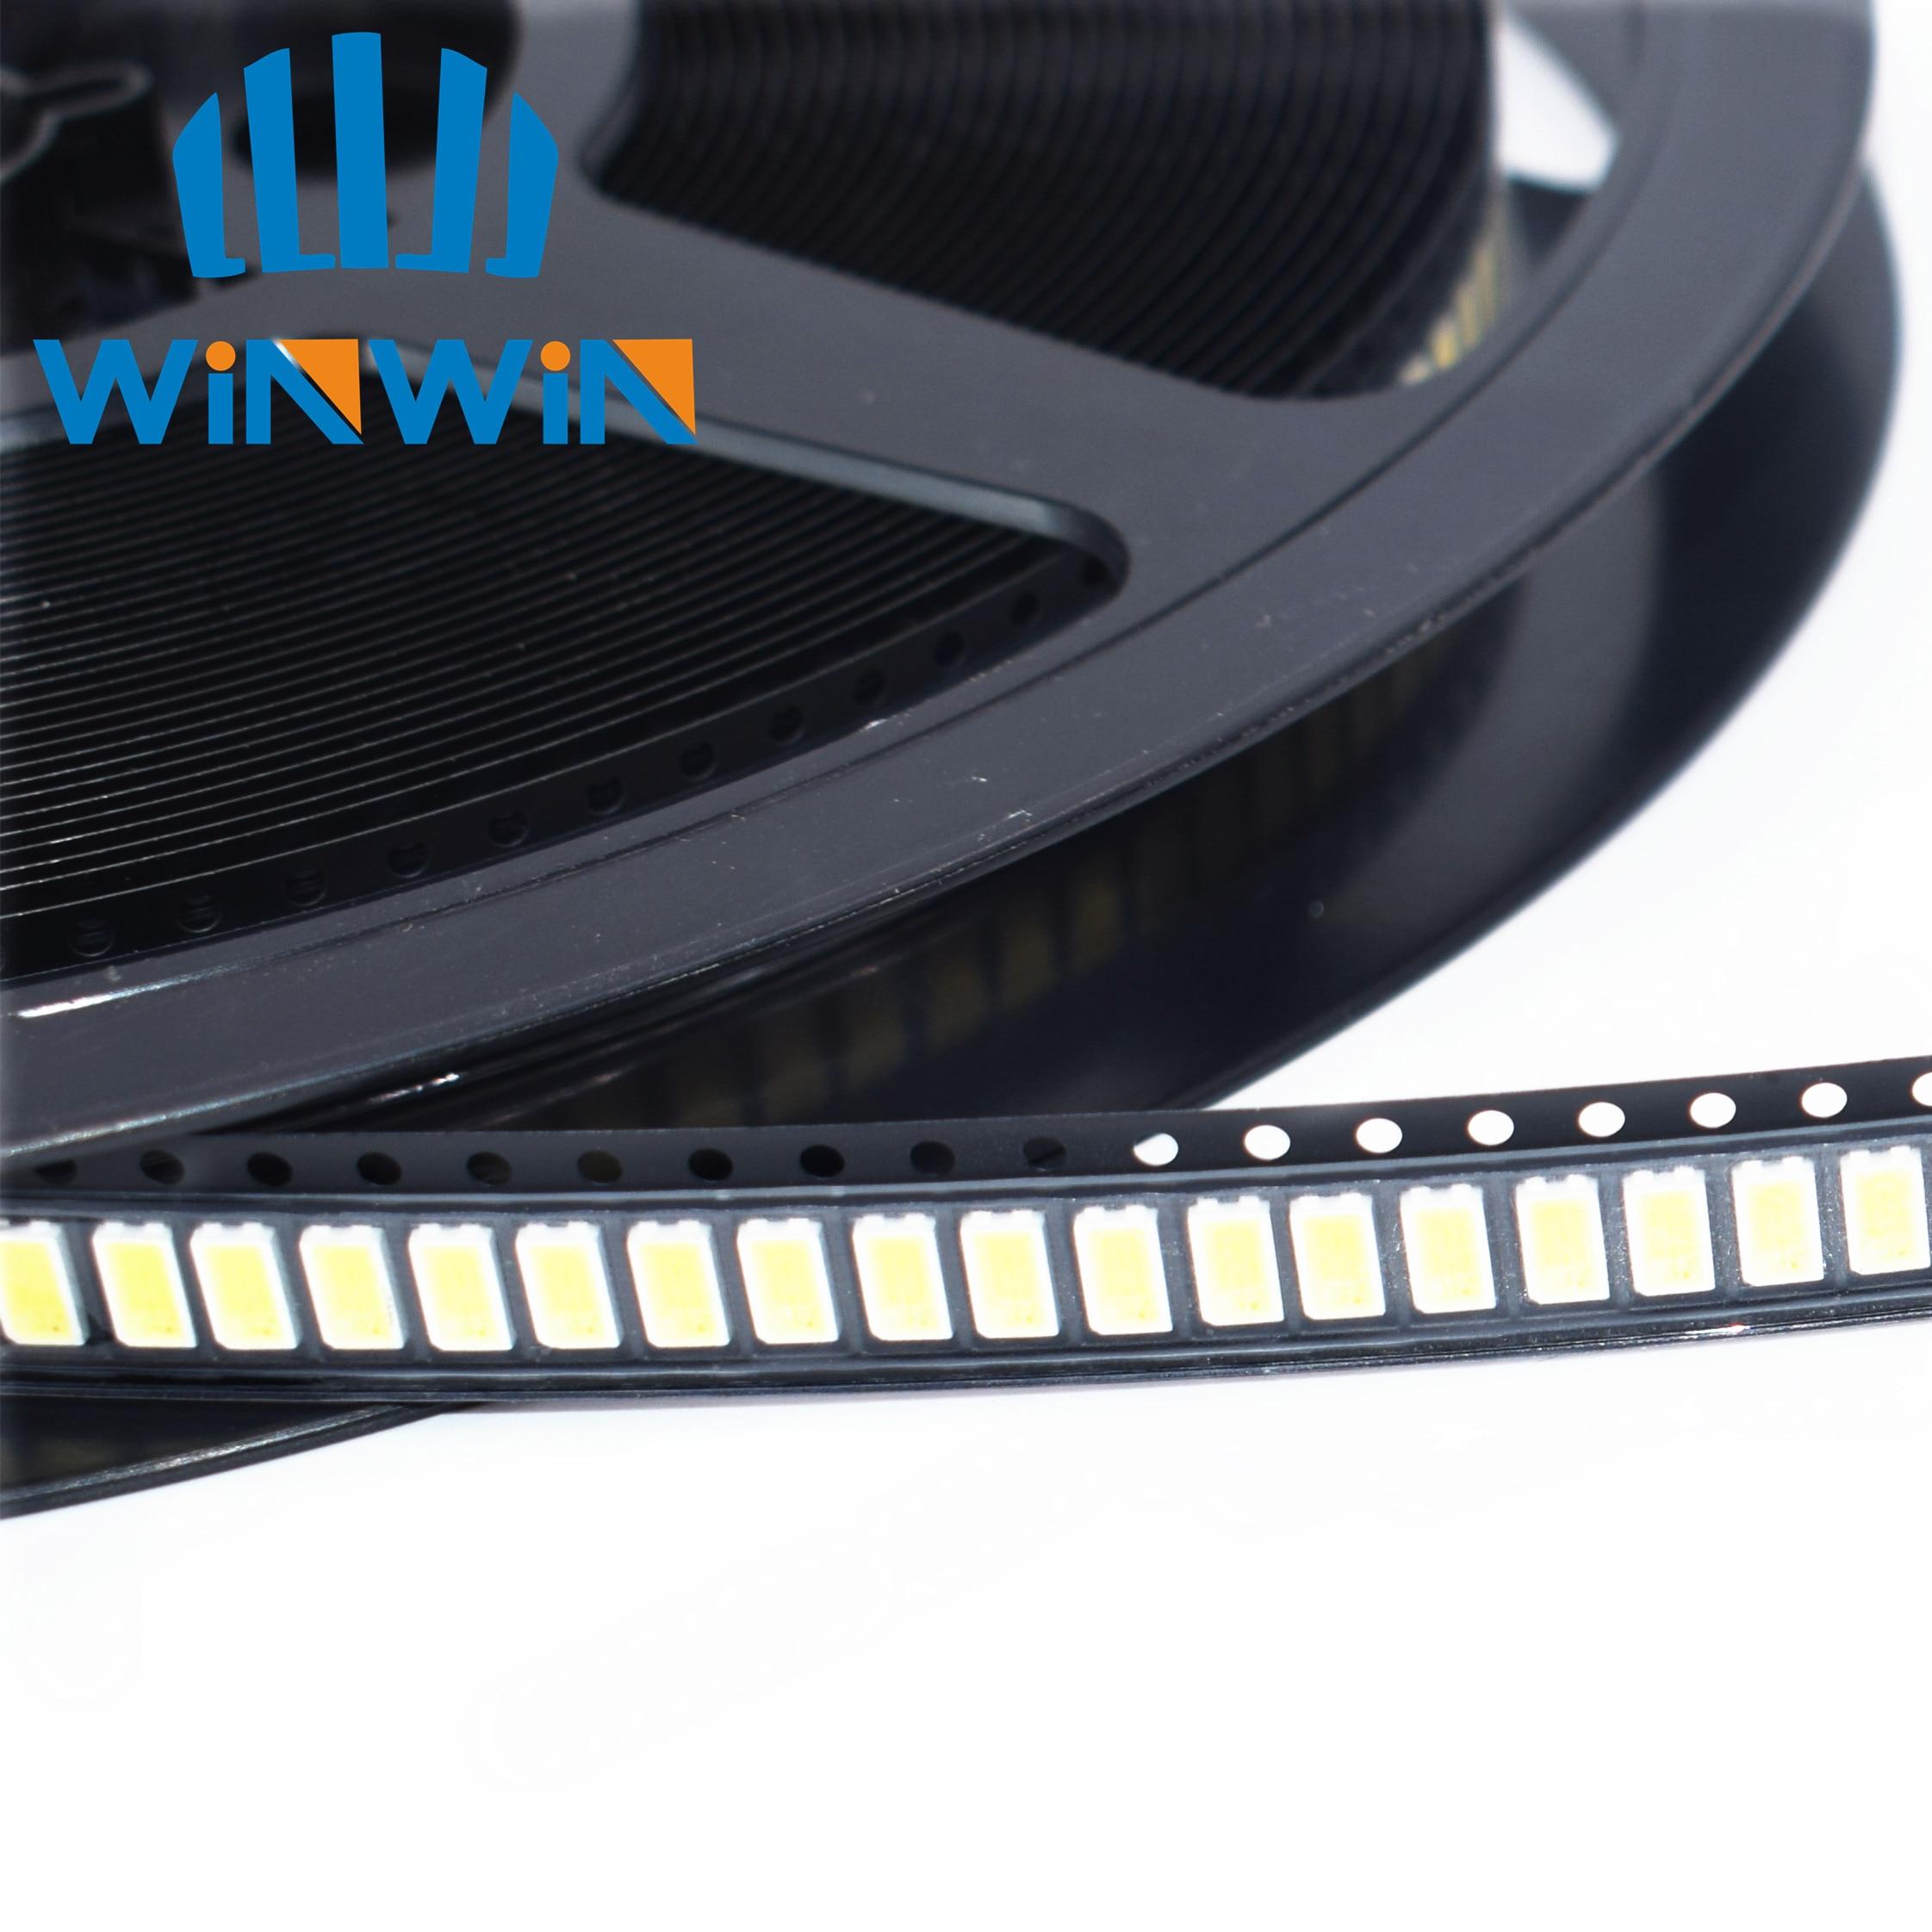 500PCS For SAMSUNG LED Backlight 0.5W 3v 5630 Cool white LCD Backlight for TV TV Application SPBWH1532S1ZVC1BIB